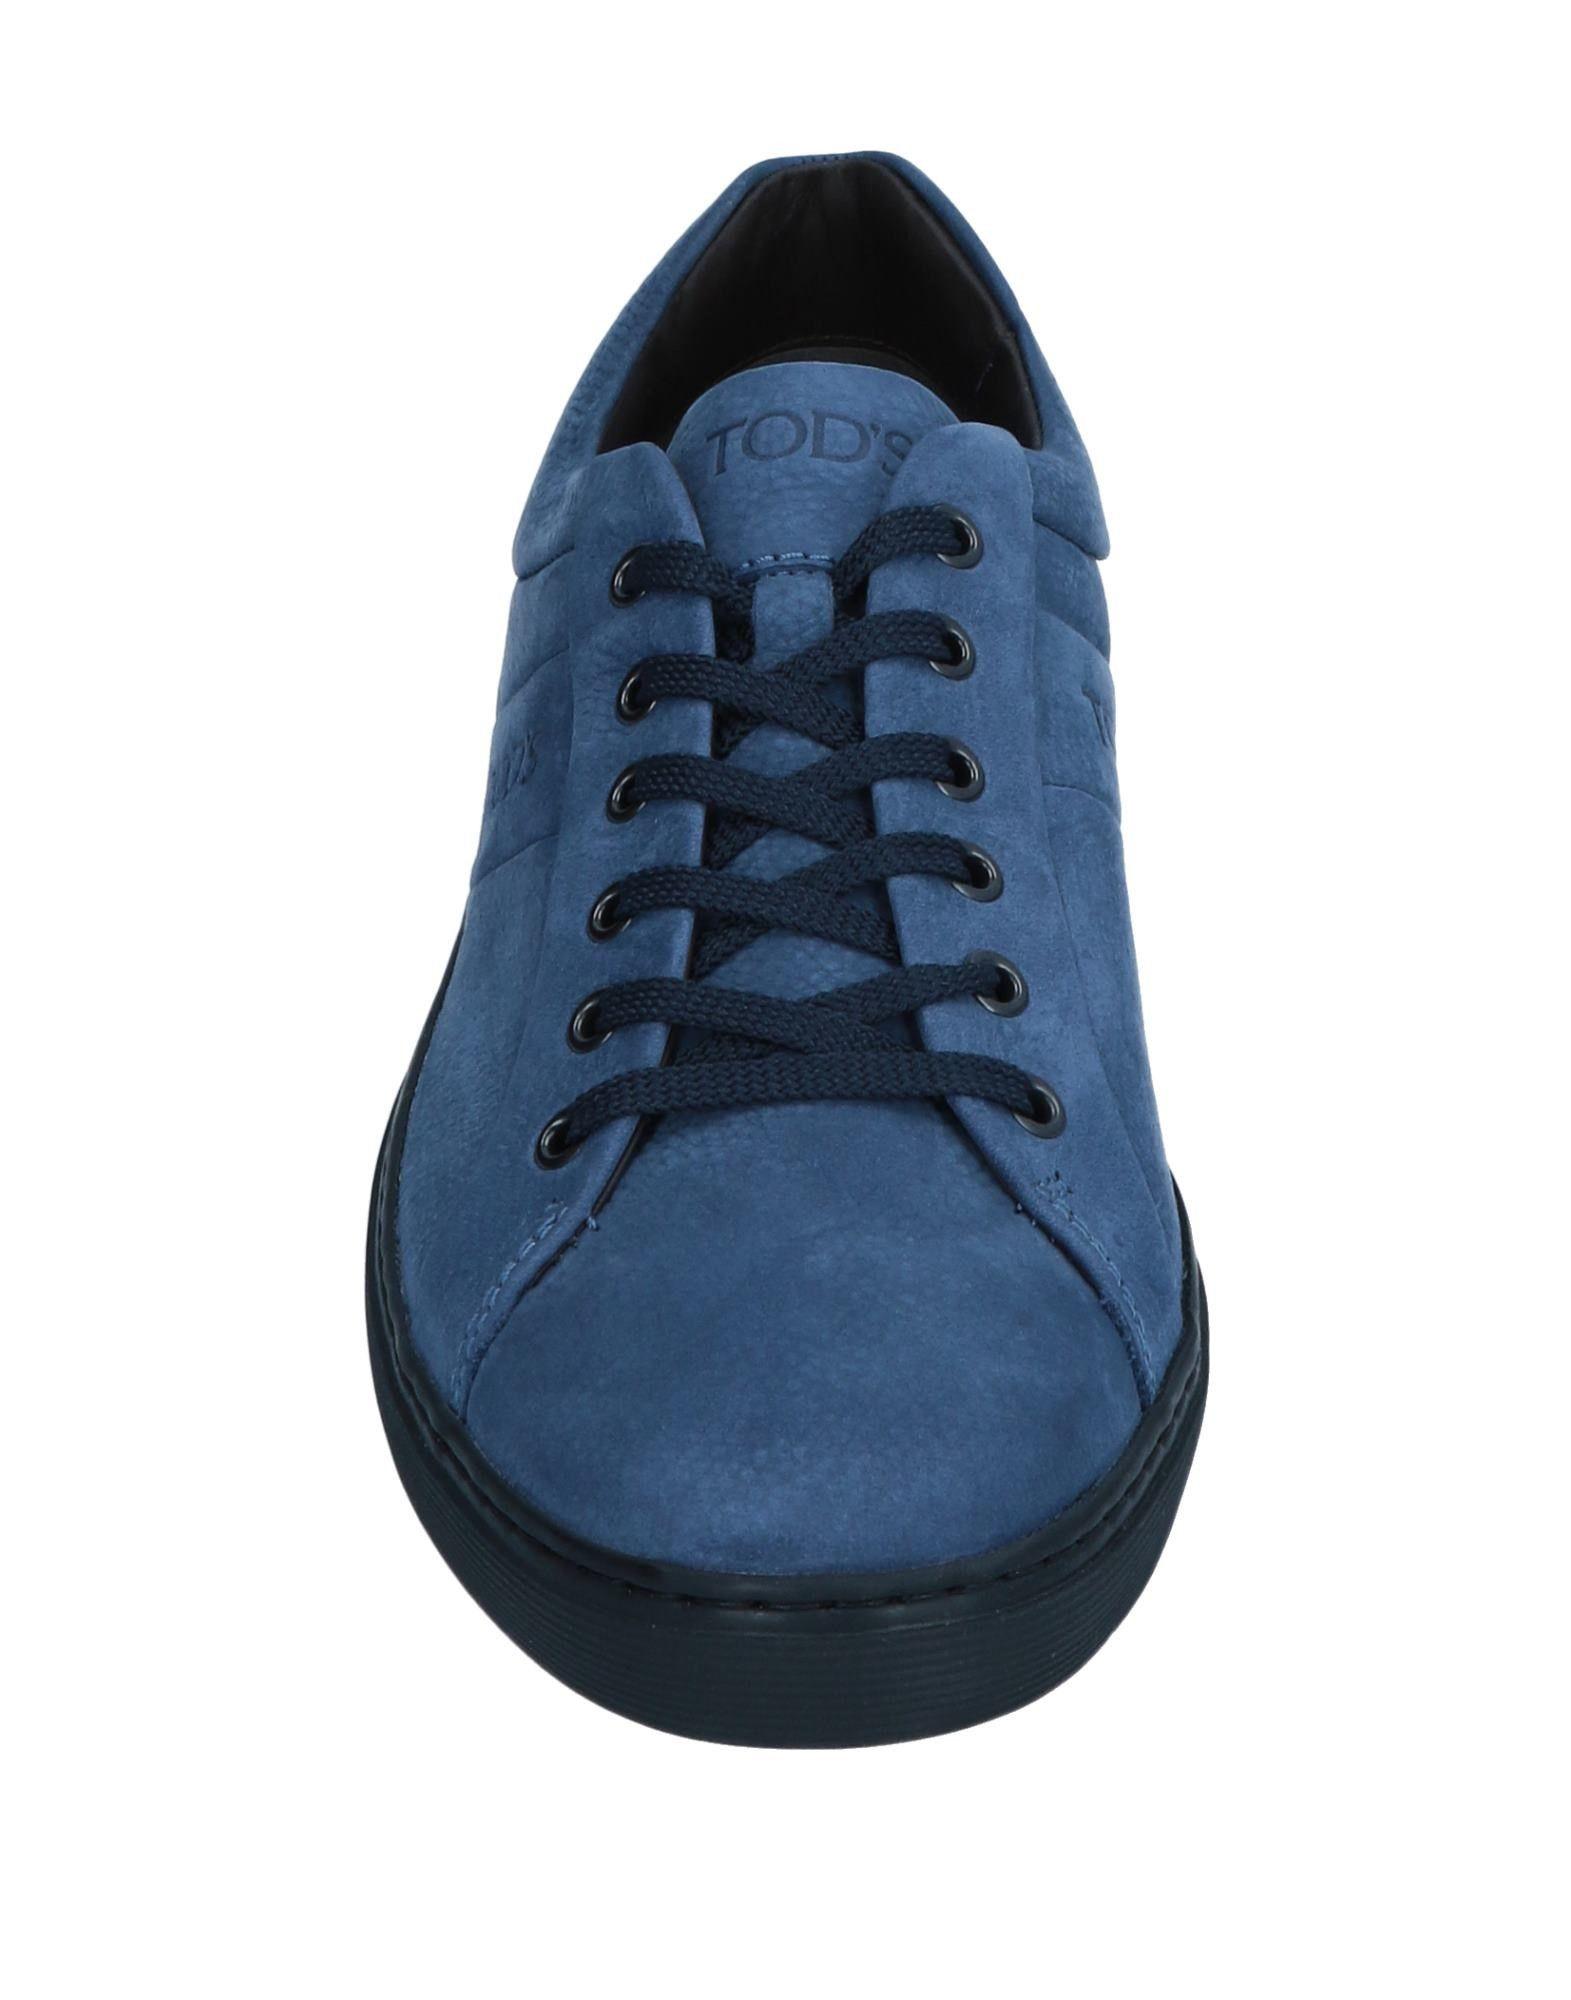 Tod's Sneakers Herren  beliebte 11548401GP Gute Qualität beliebte  Schuhe a14fcd